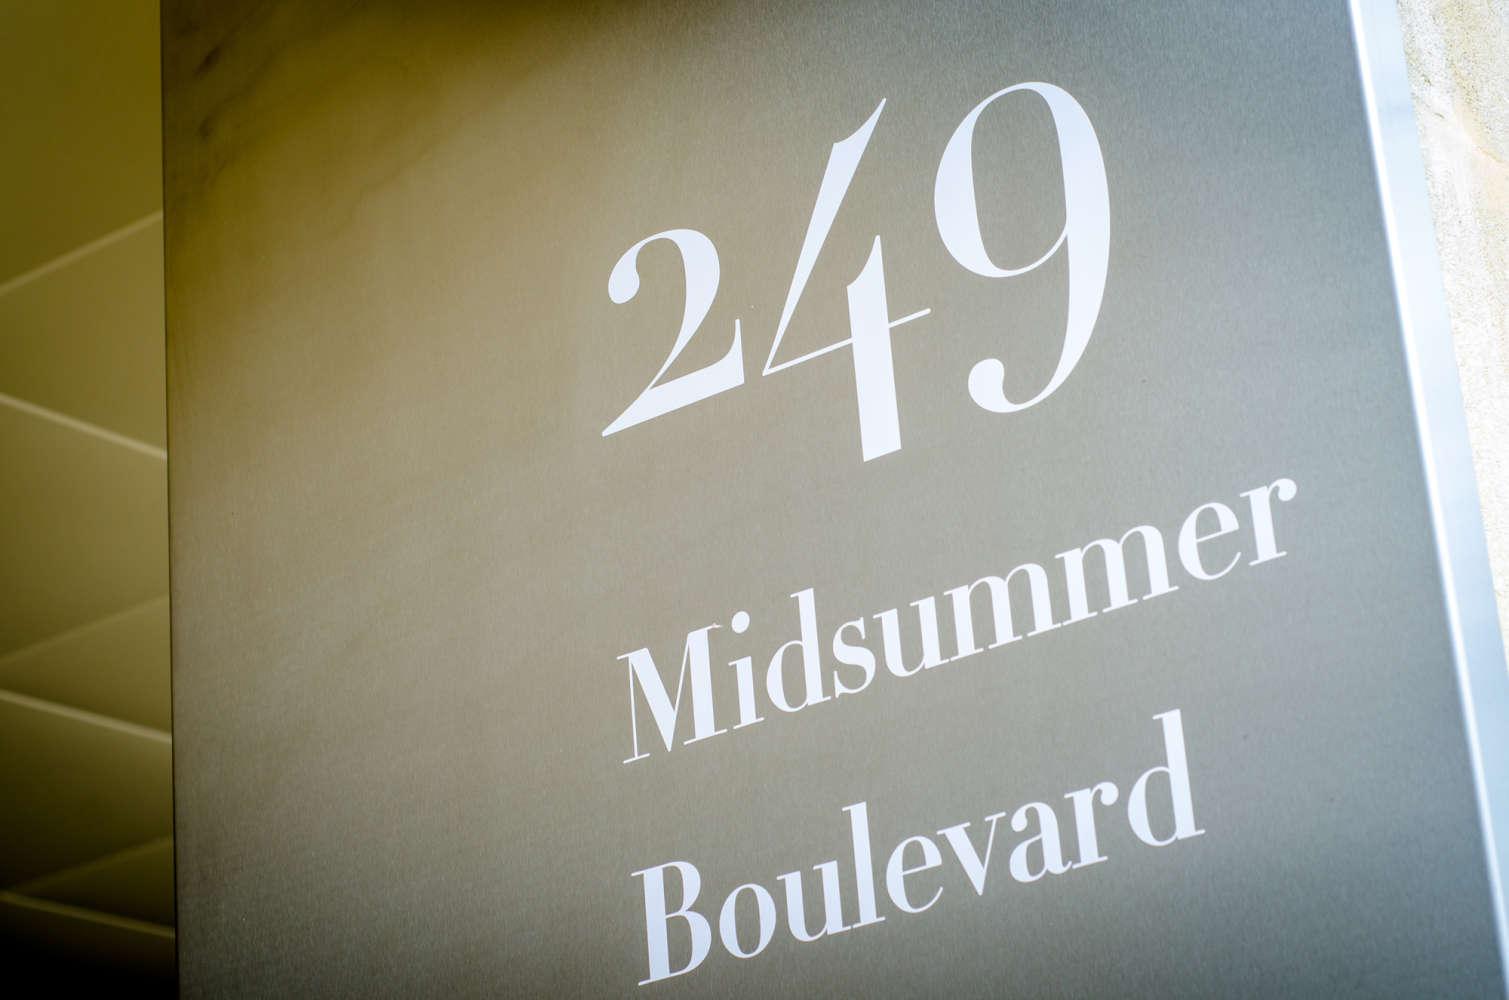 Office Milton keynes, MK9 1EA - 249 Midsummer Boulevard - 2